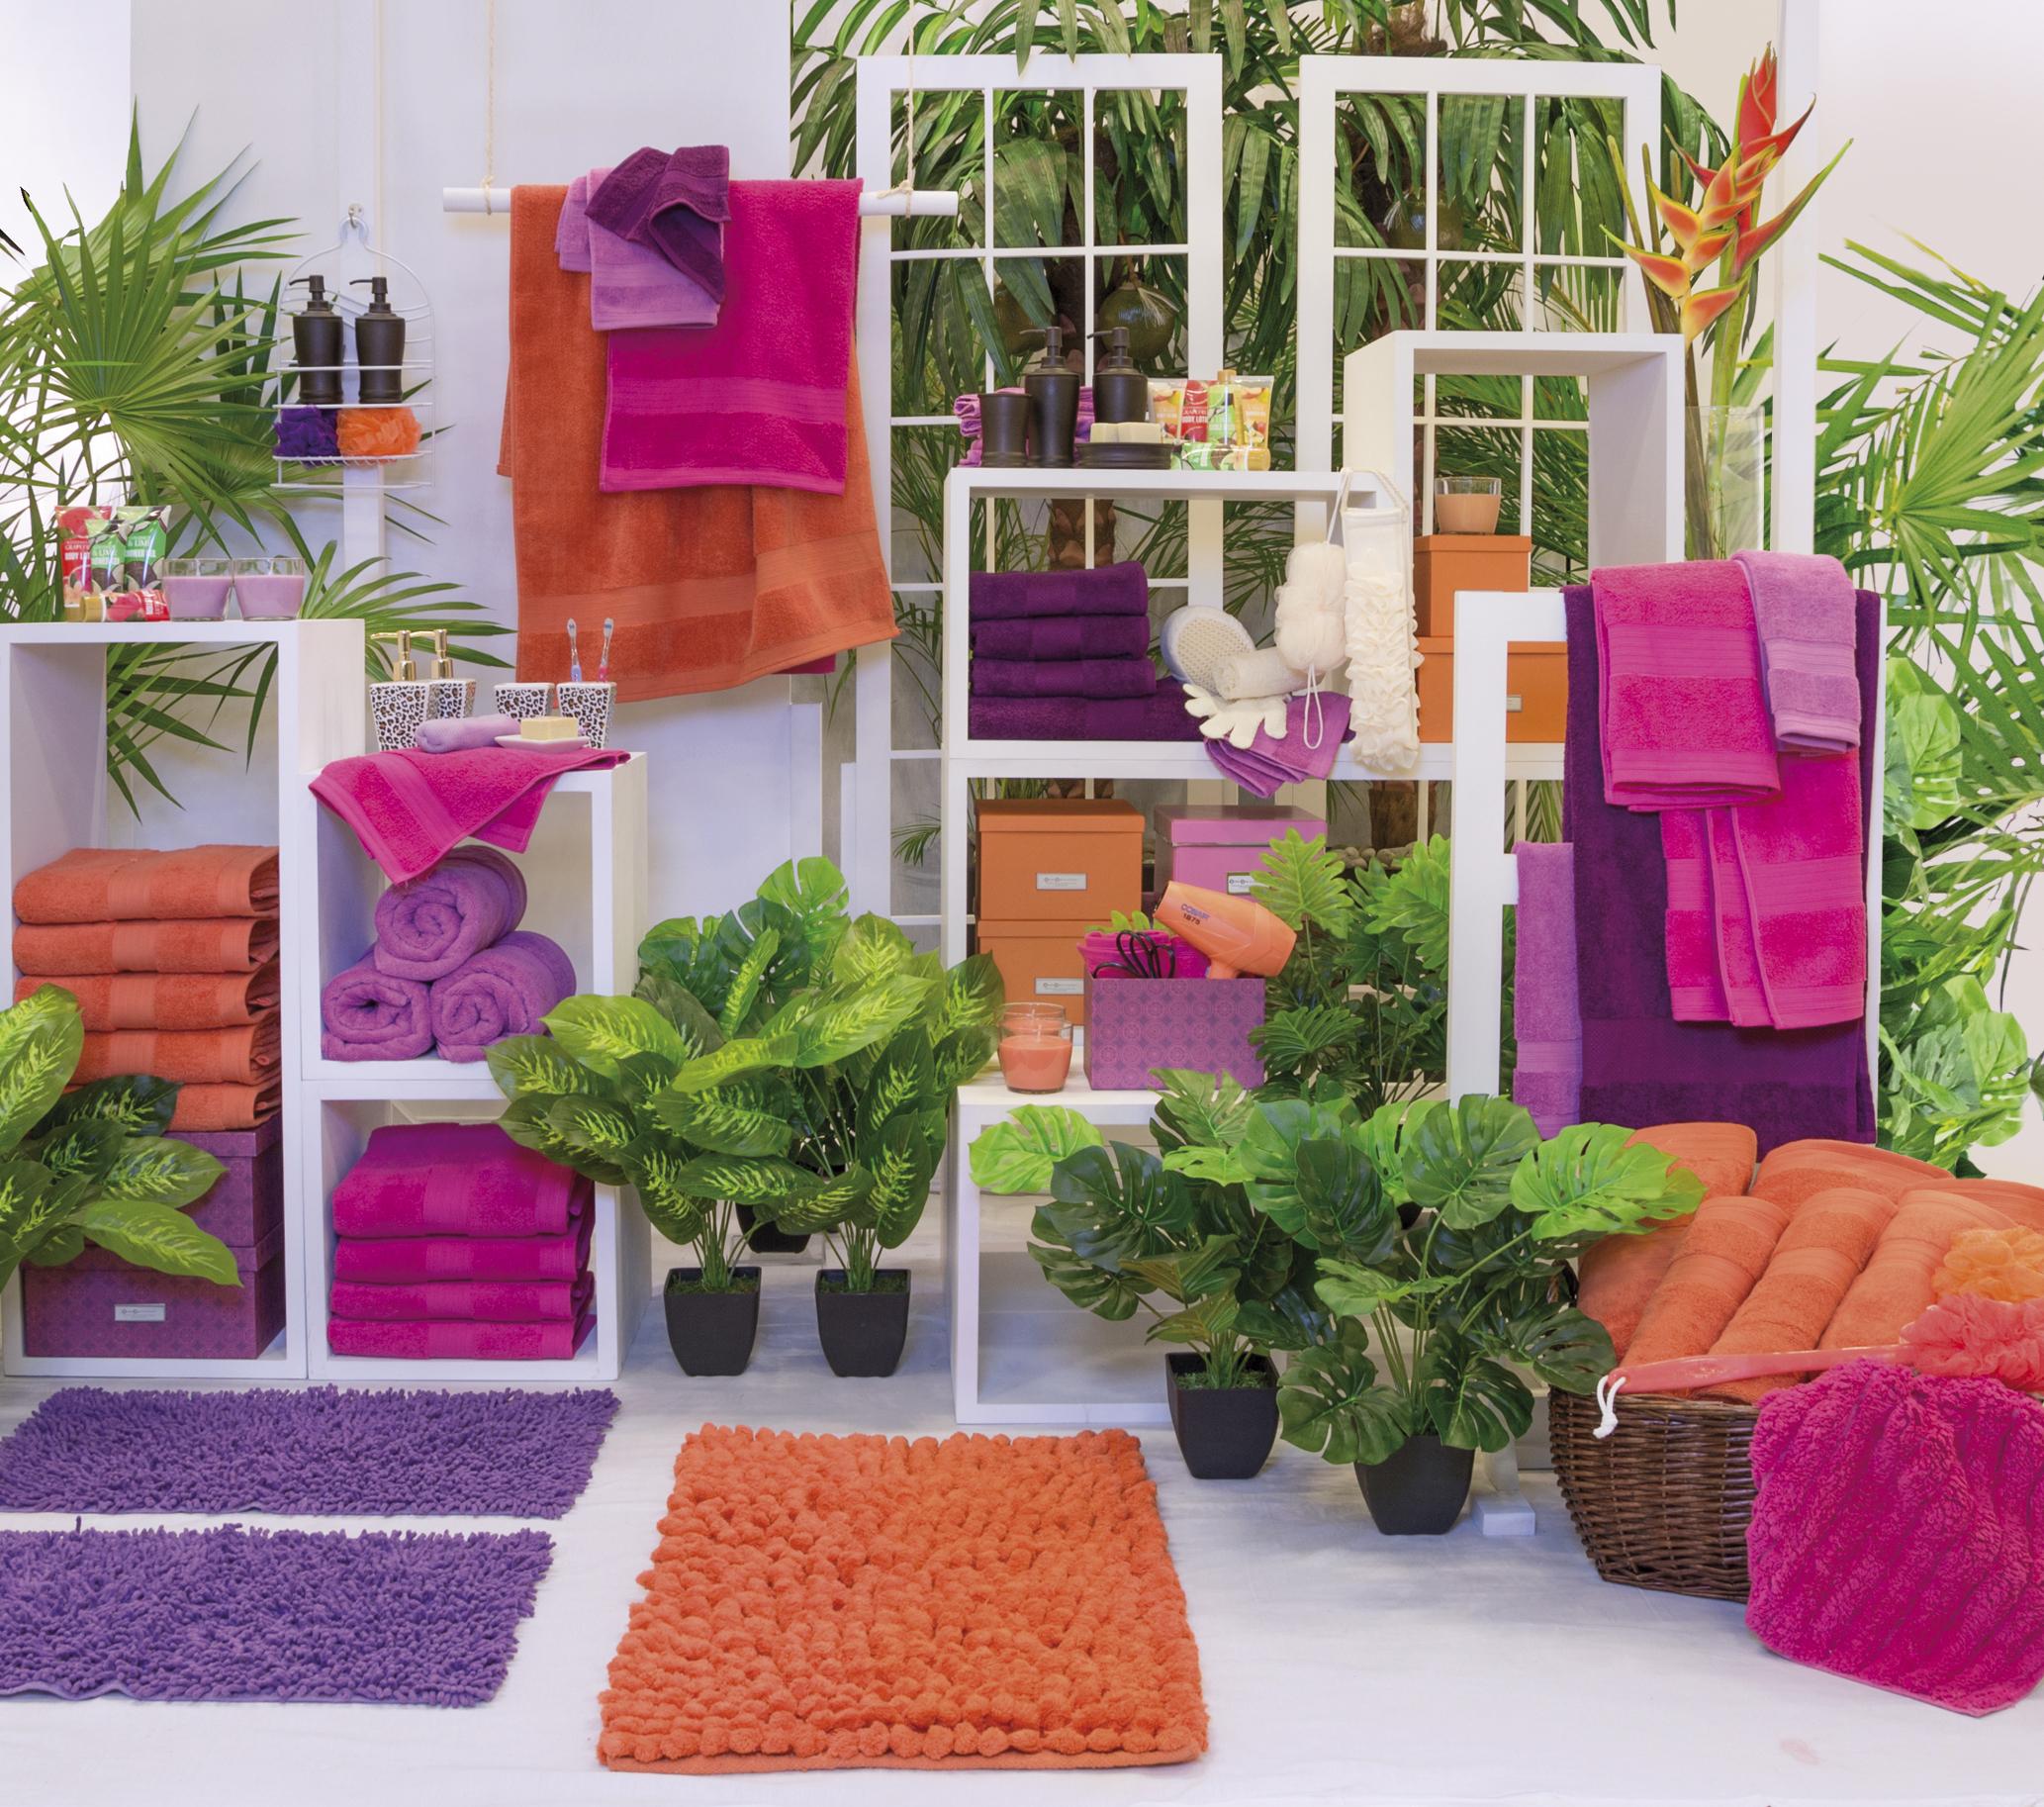 Muebles Para Espacios Peque Os Actitudfem # Muebles Departamentos Pequenos Df